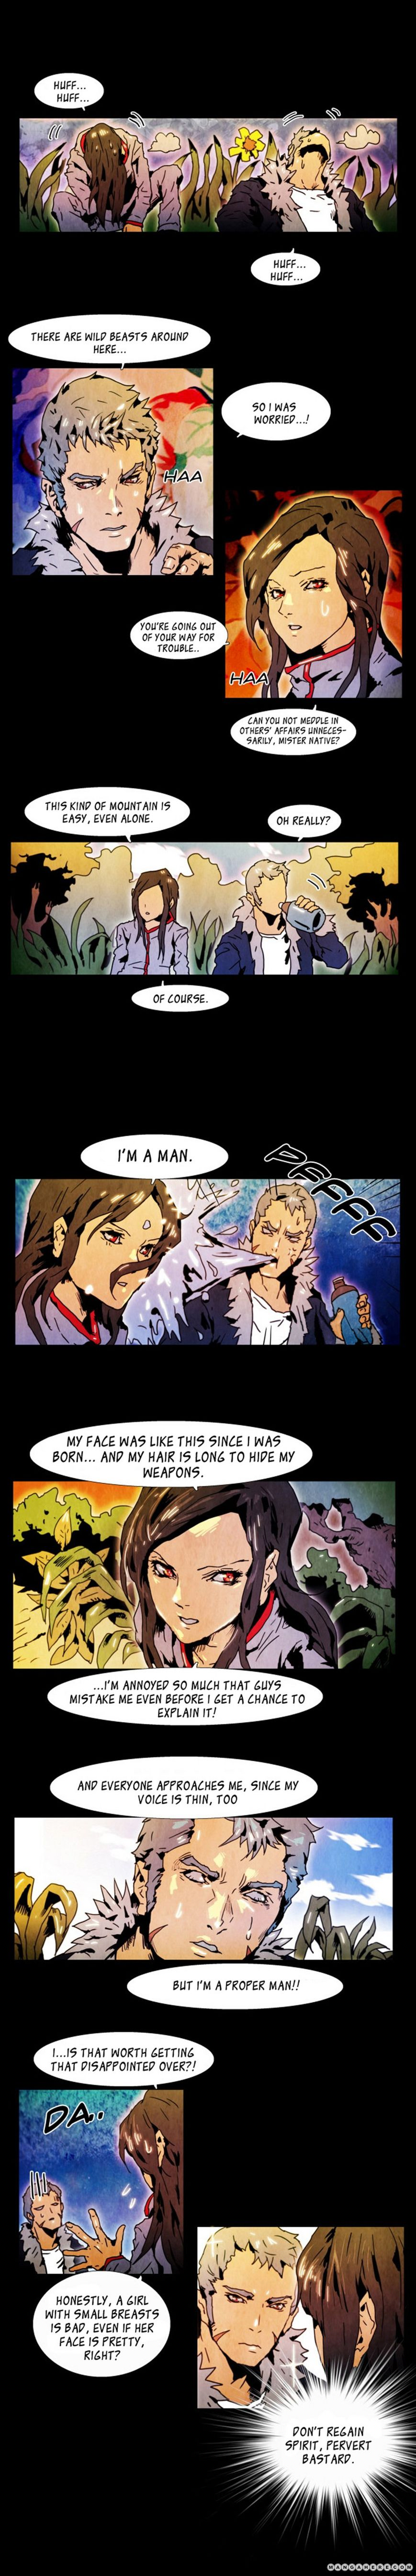 Black Behemoth 1 Page 3